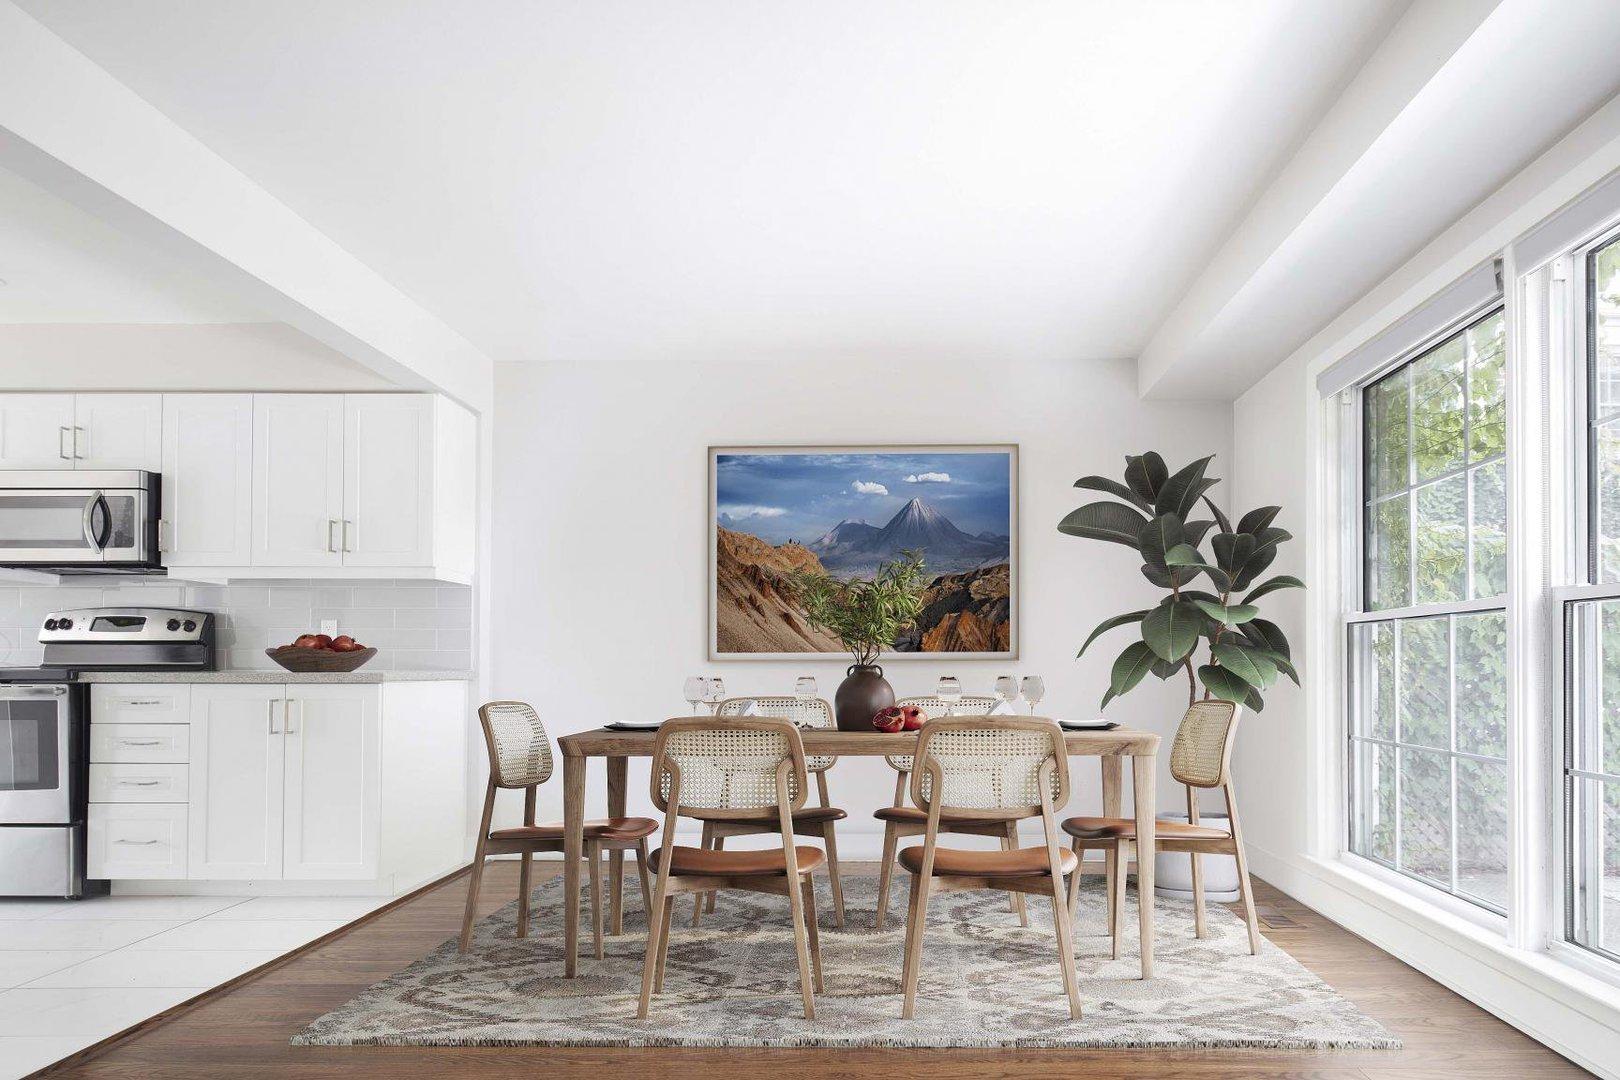 Brilliant Rentals Ca Toronto Apartments Condos And Houses For Rent Home Interior And Landscaping Ologienasavecom